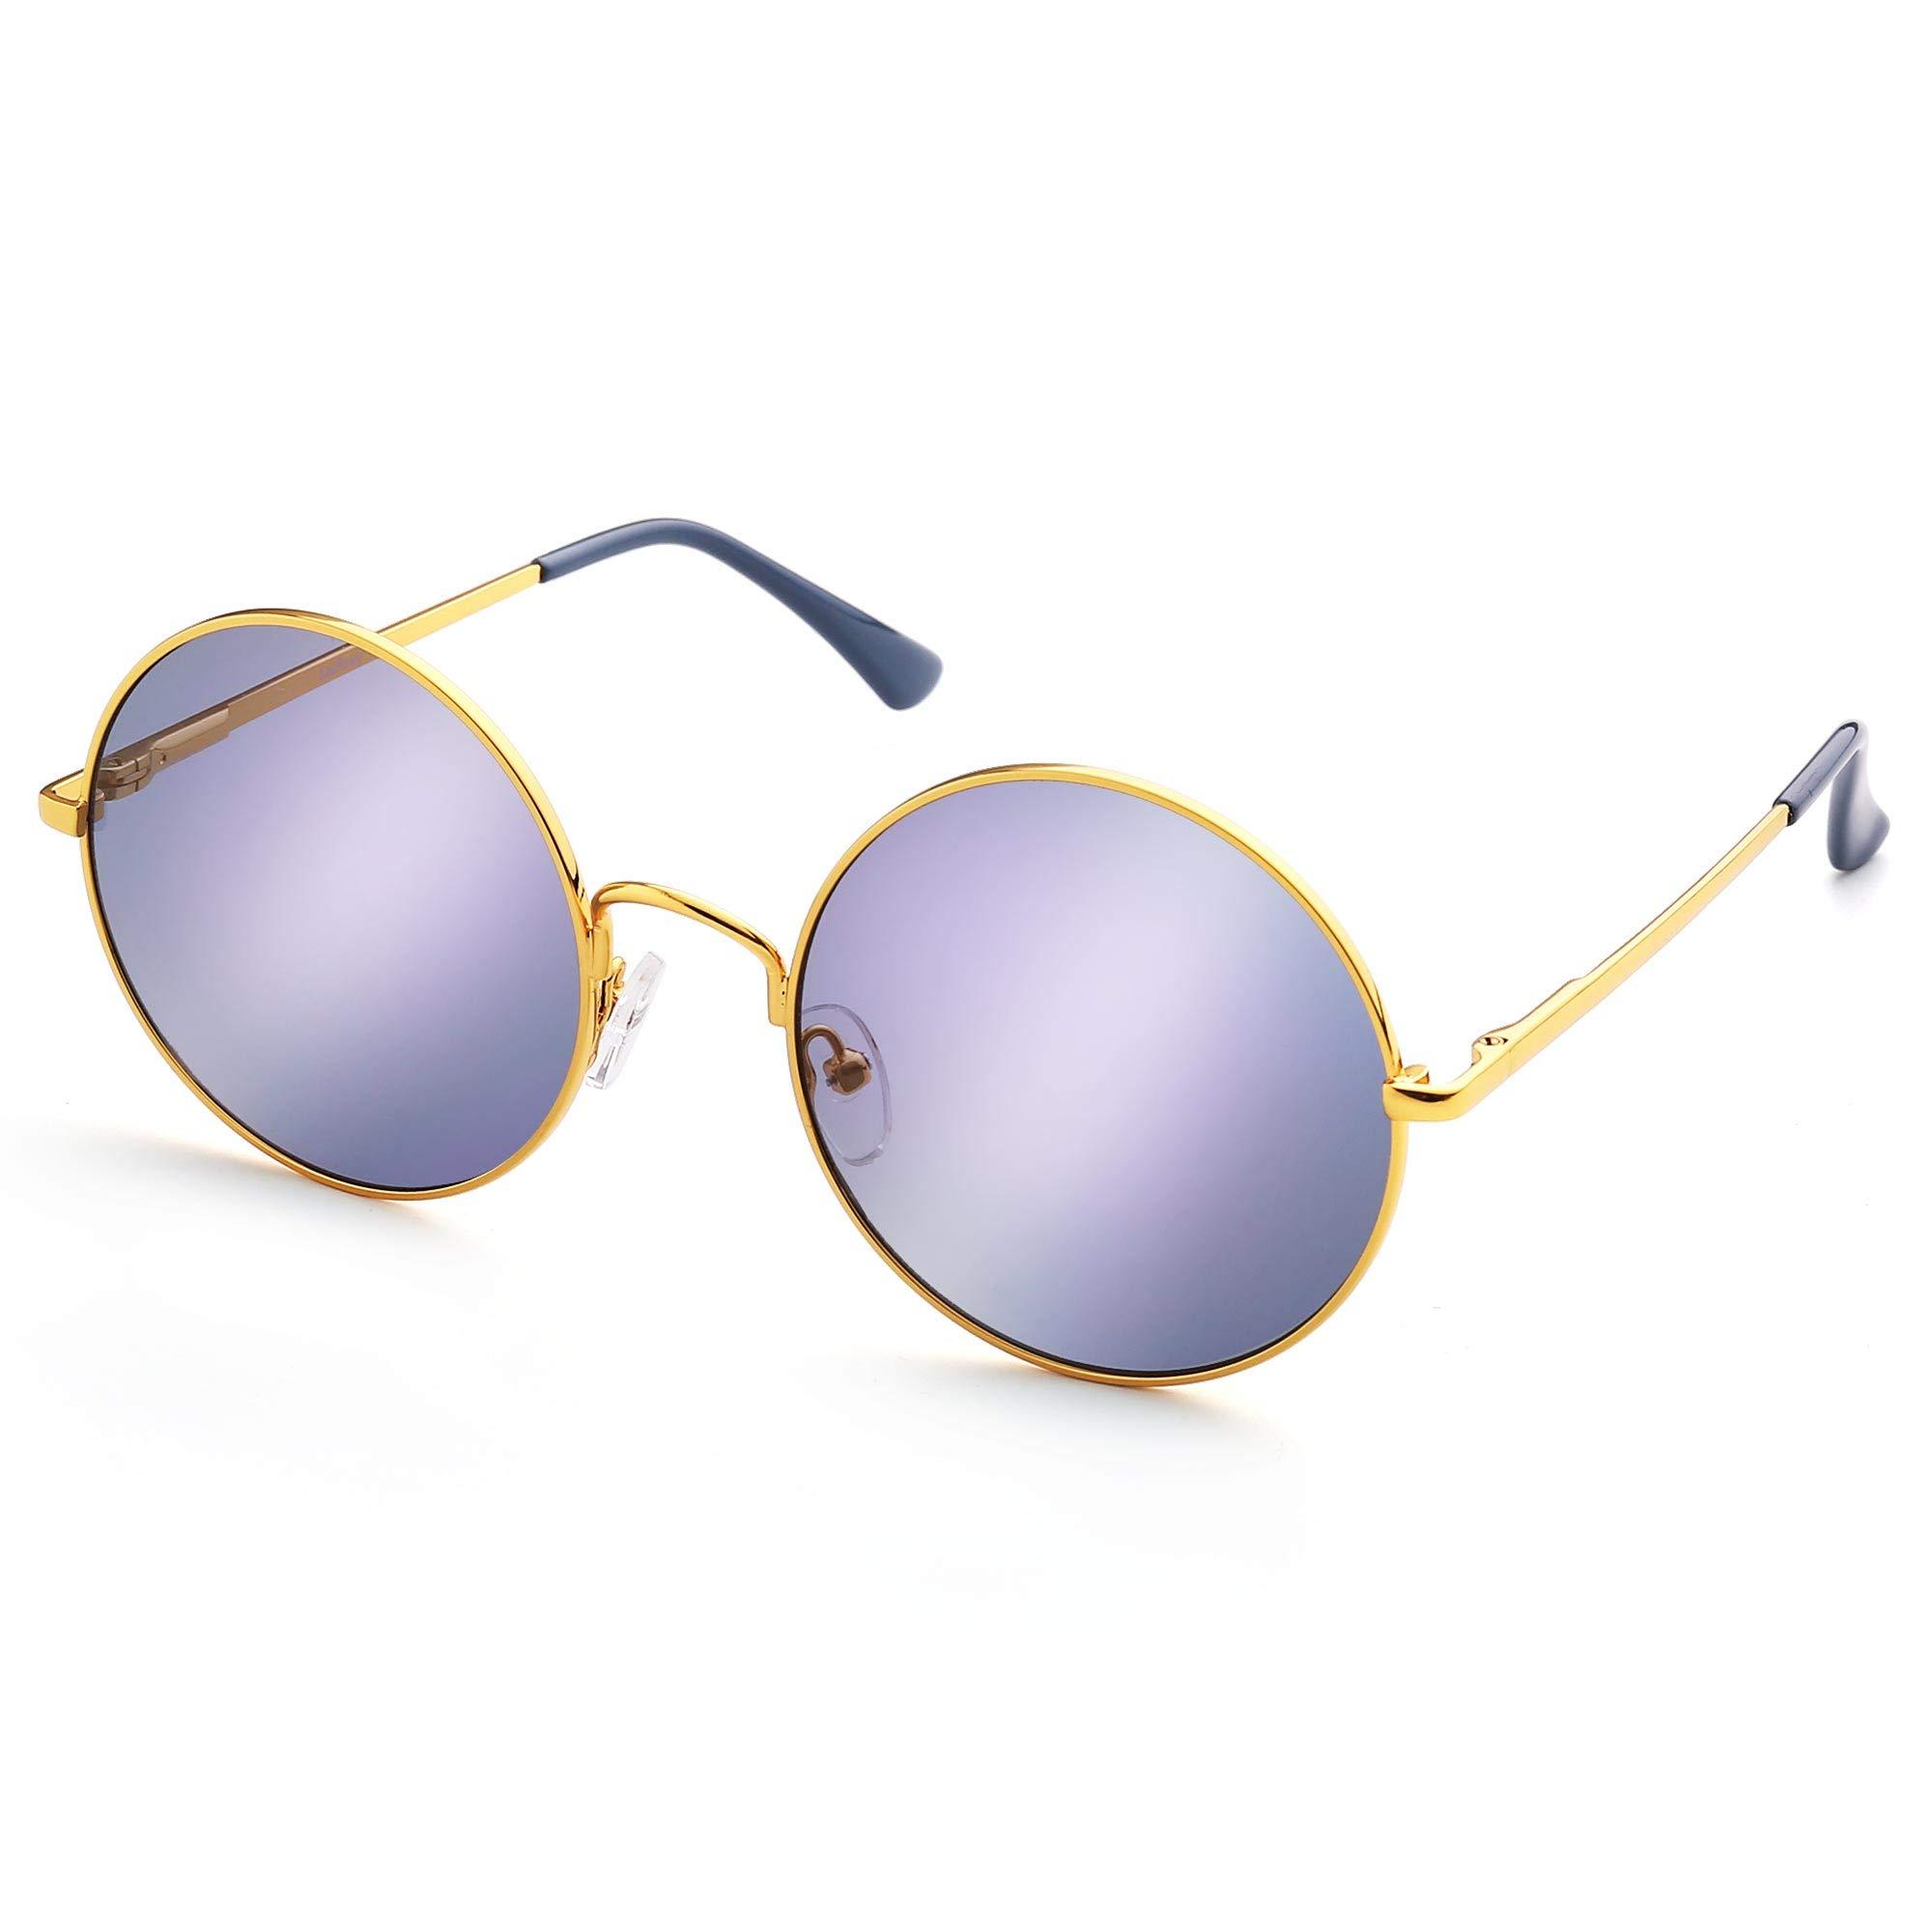 Vintage Round Sunglasses for Women Men, Mirrored Circle Sunglasses, Hippie Steampunk Style